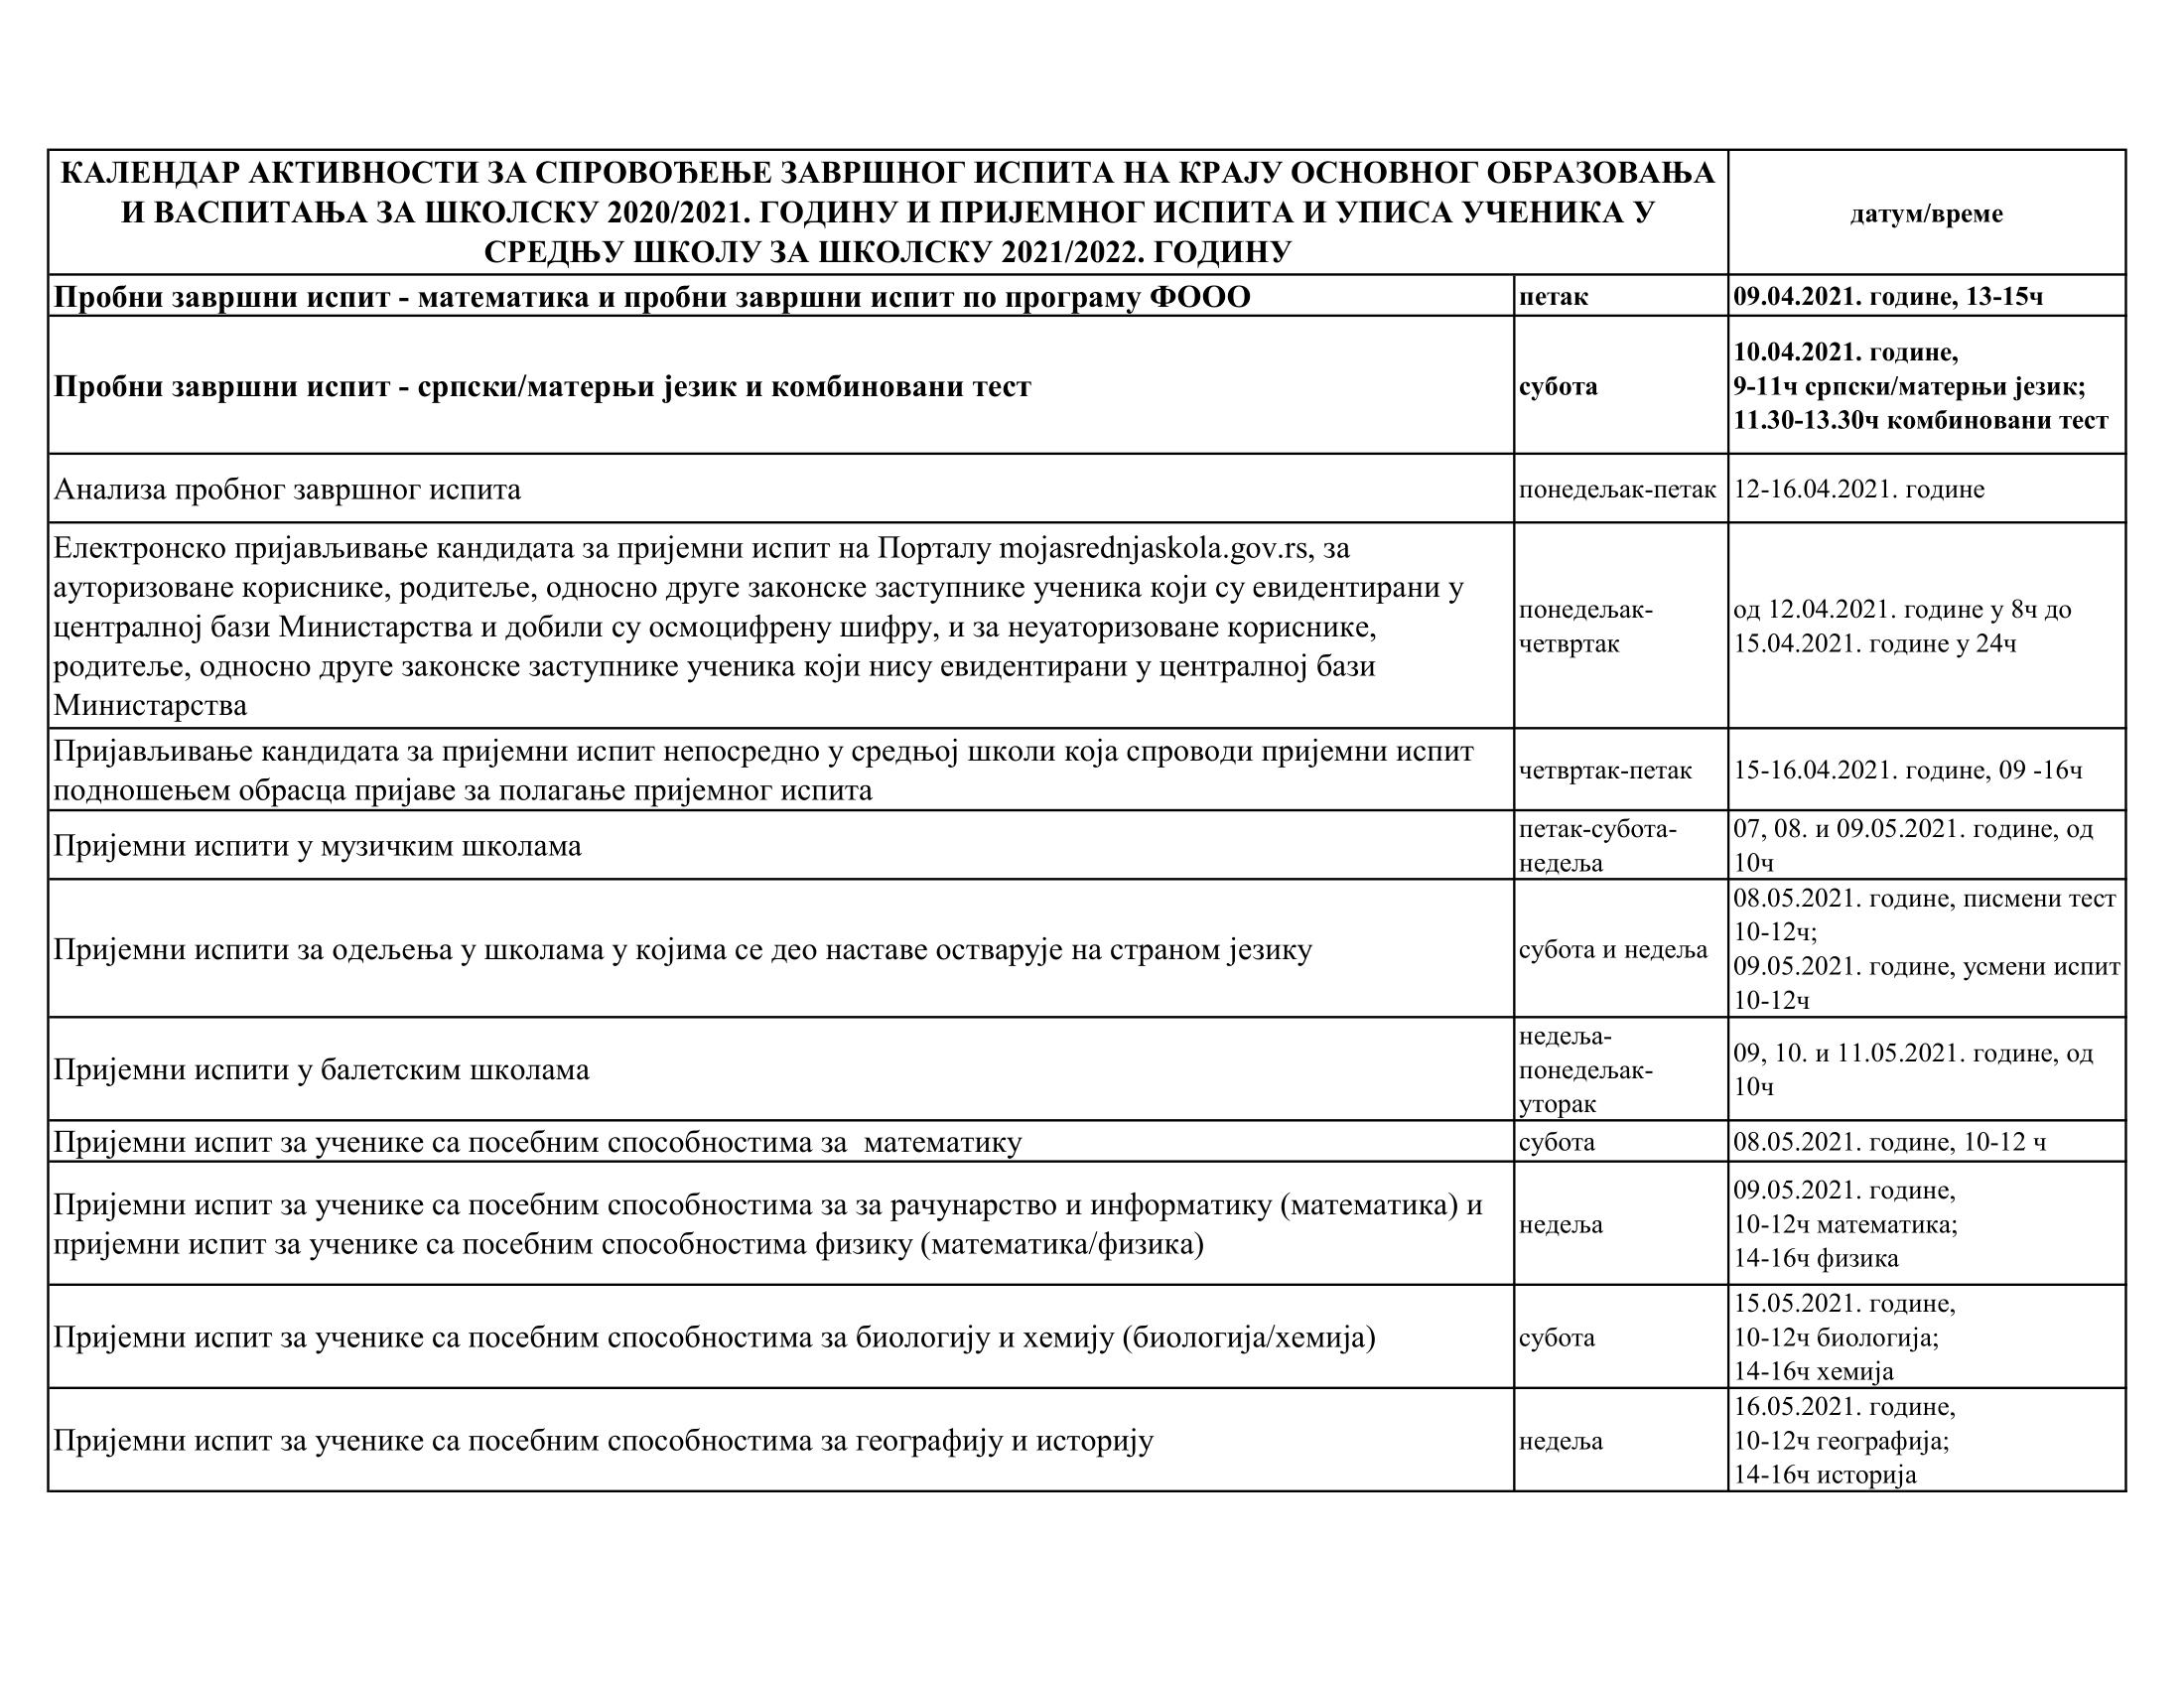 Календар уписних активности